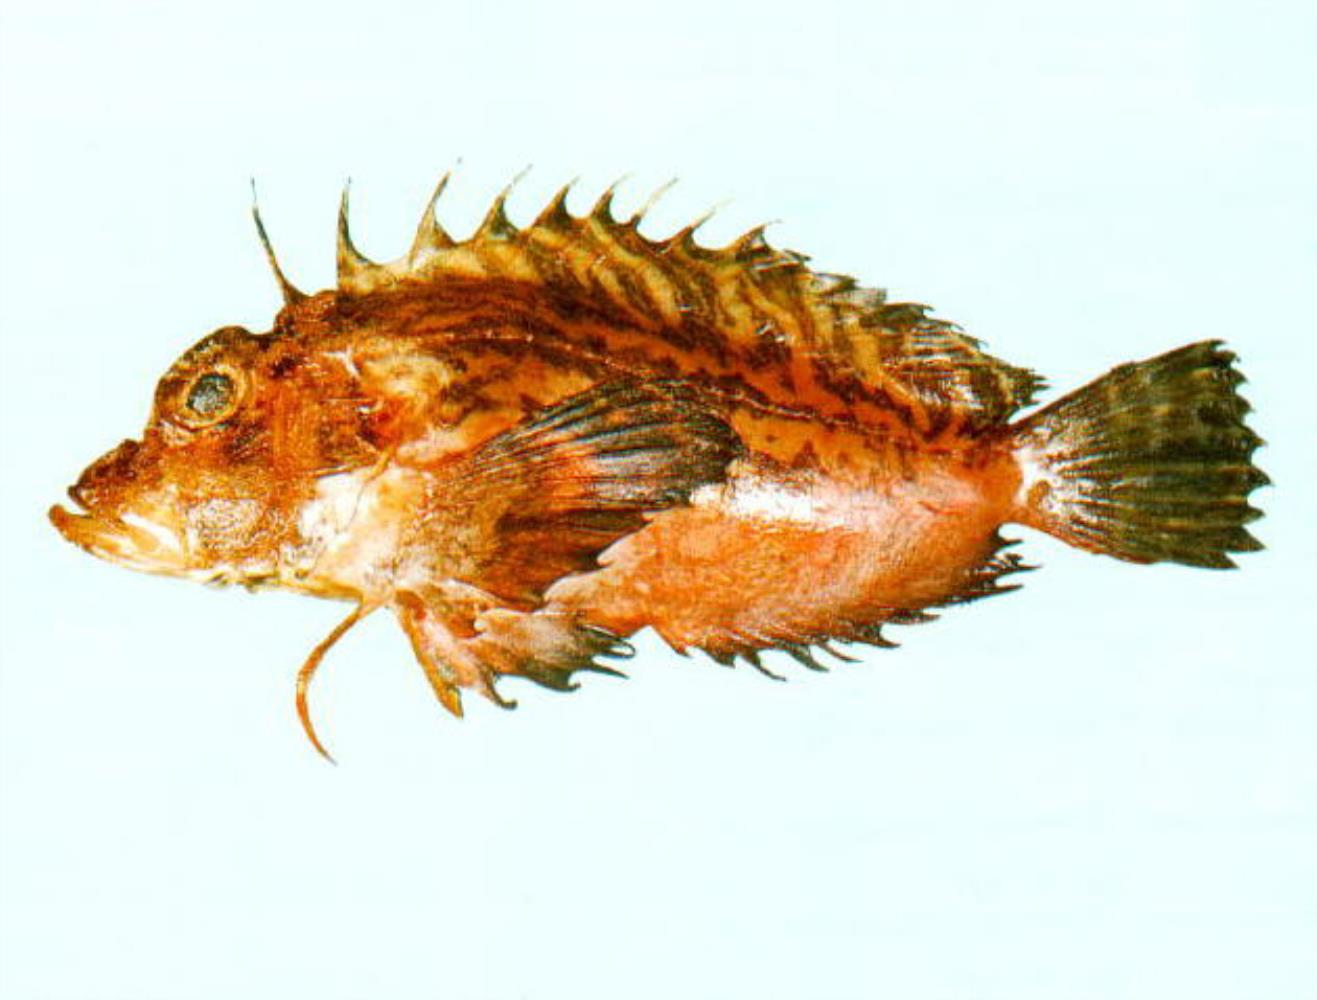 Plumstriped Stingfish